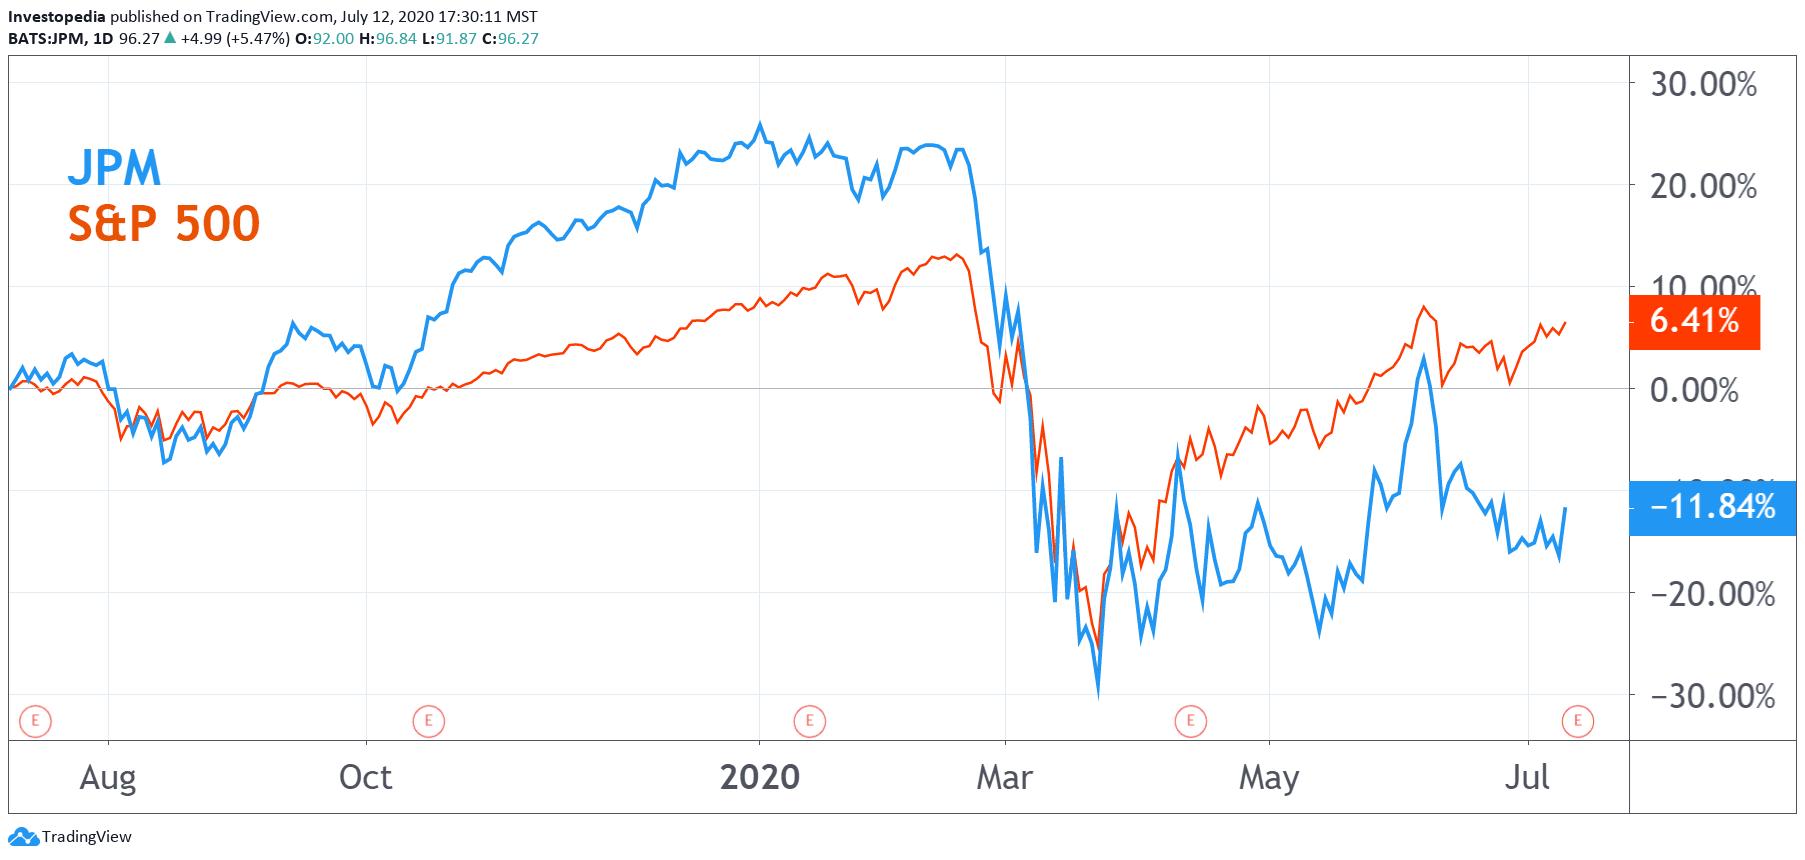 JPM vs. S&P 500 1-Year Performance